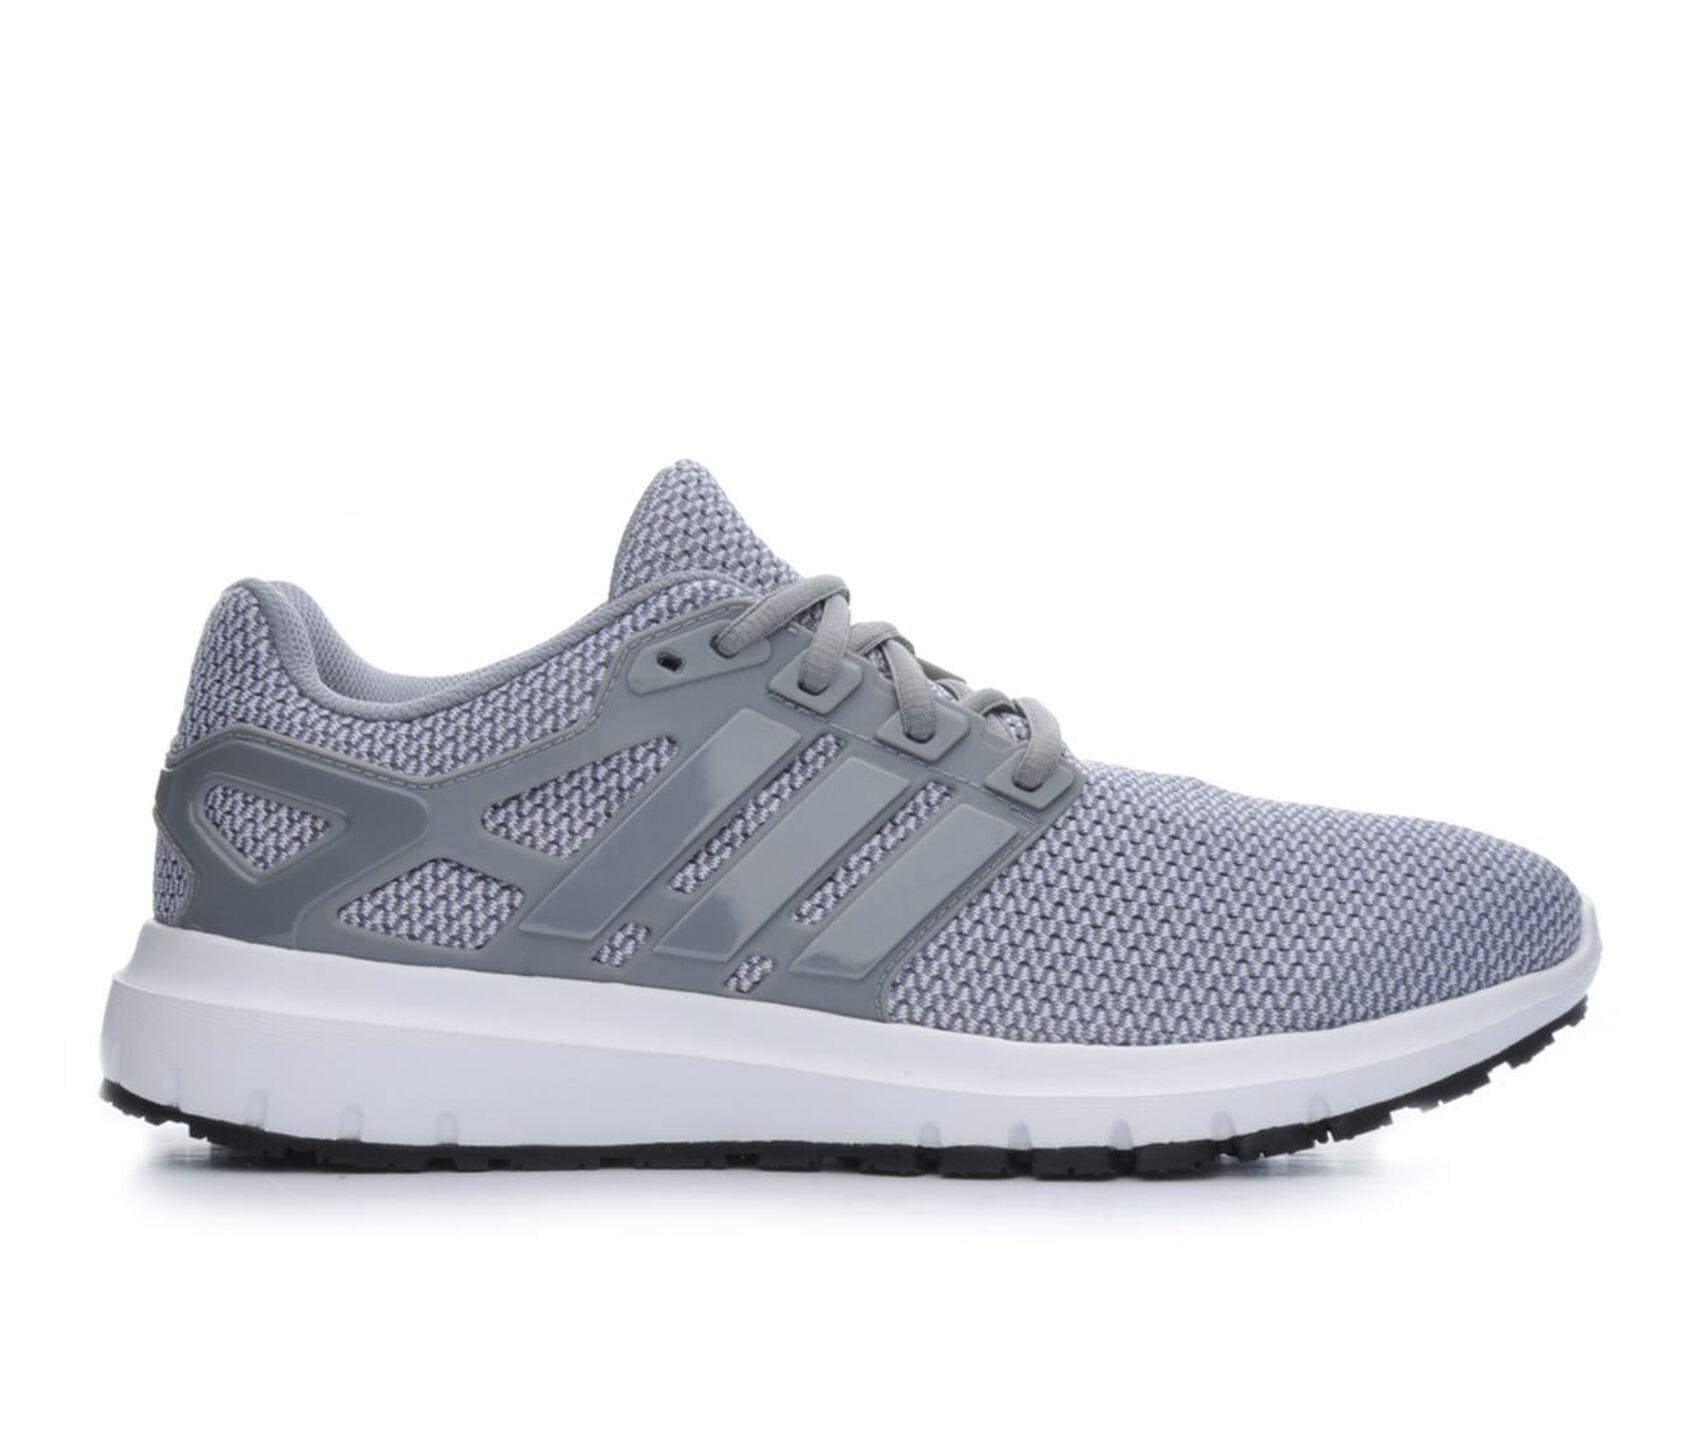 Adidas Men S Energy Cloud Running Shoes E